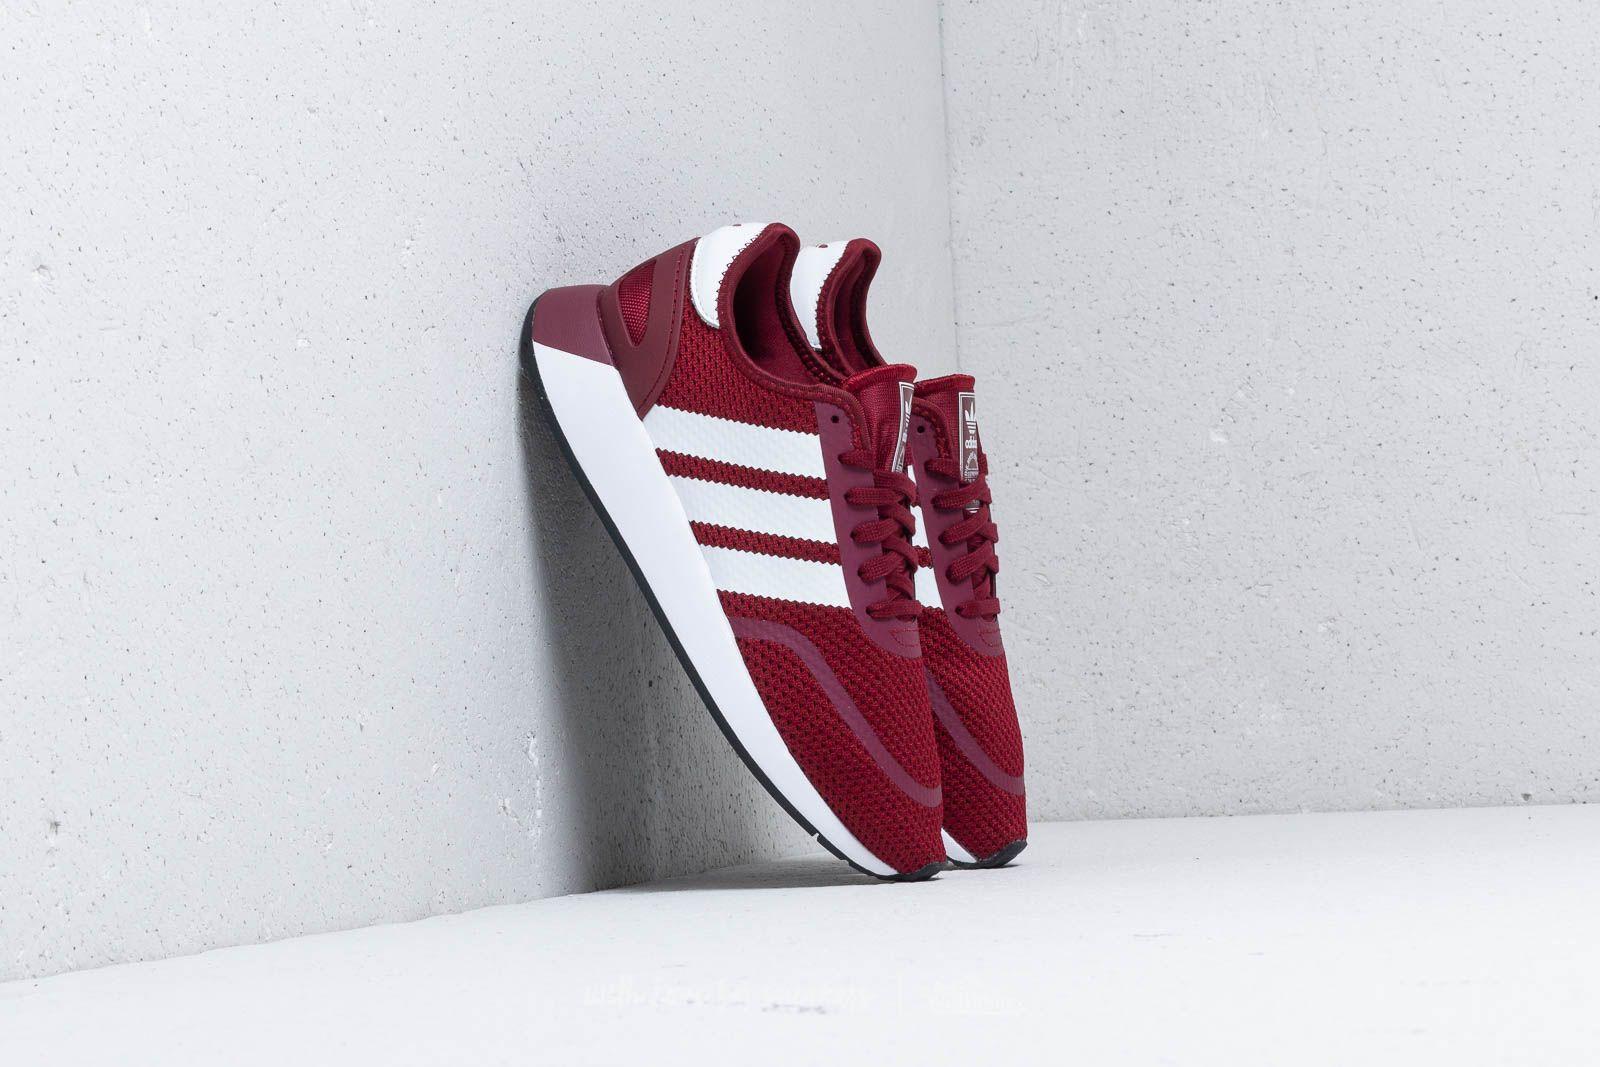 adidas N 5923 Collegiate Burgundy Ftw White Core Black | Footshop